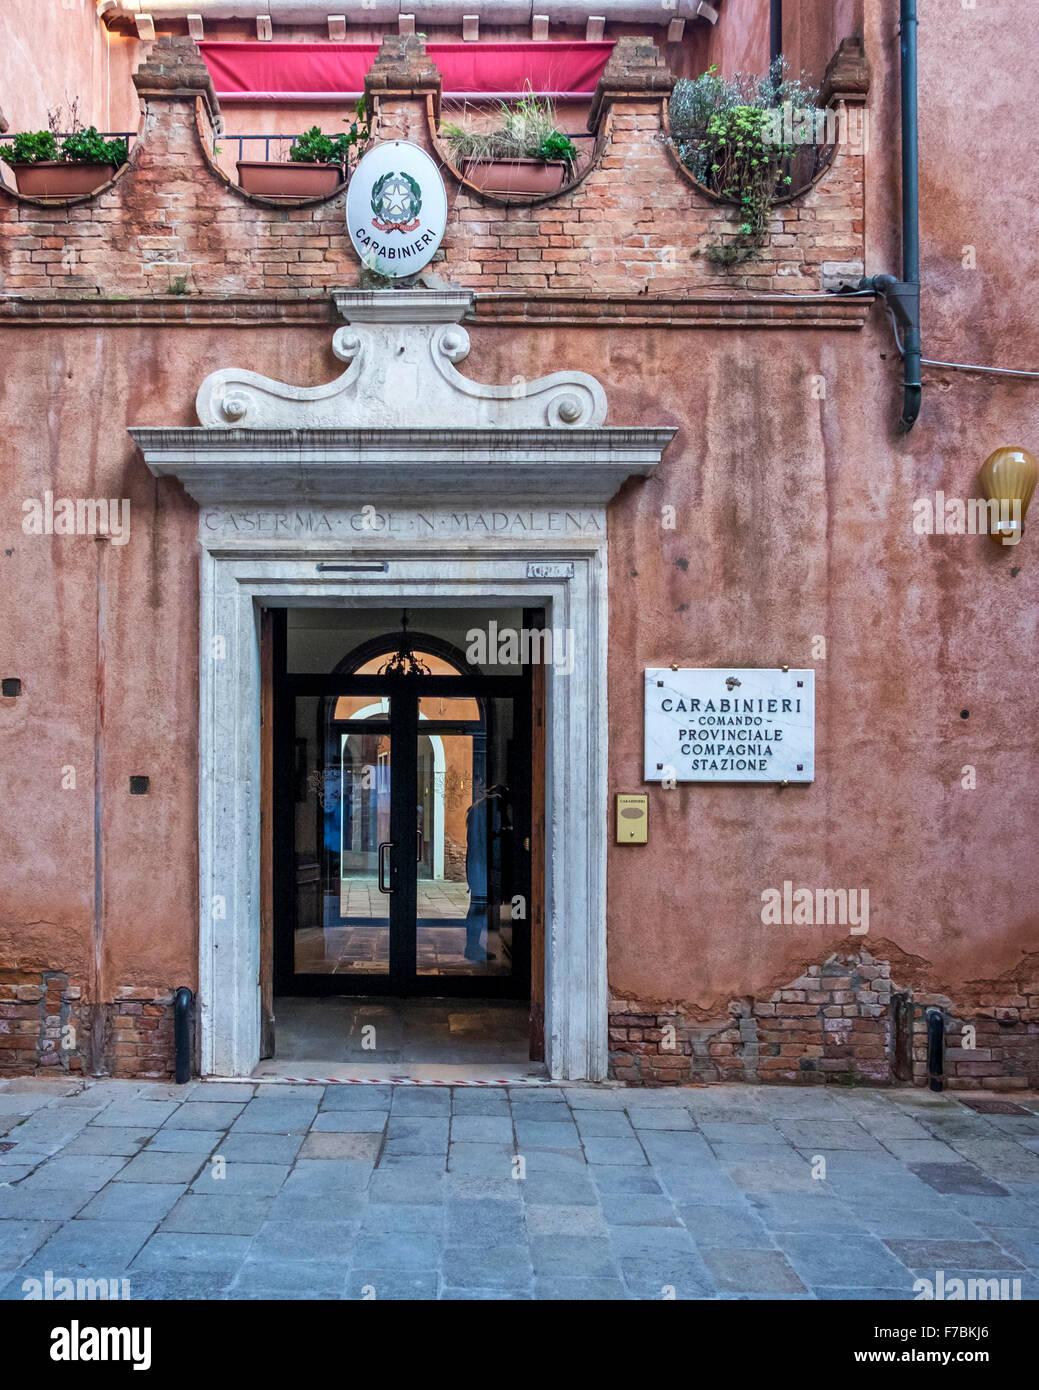 Venice Italy. Police station entrance. elegant arched door frame ...